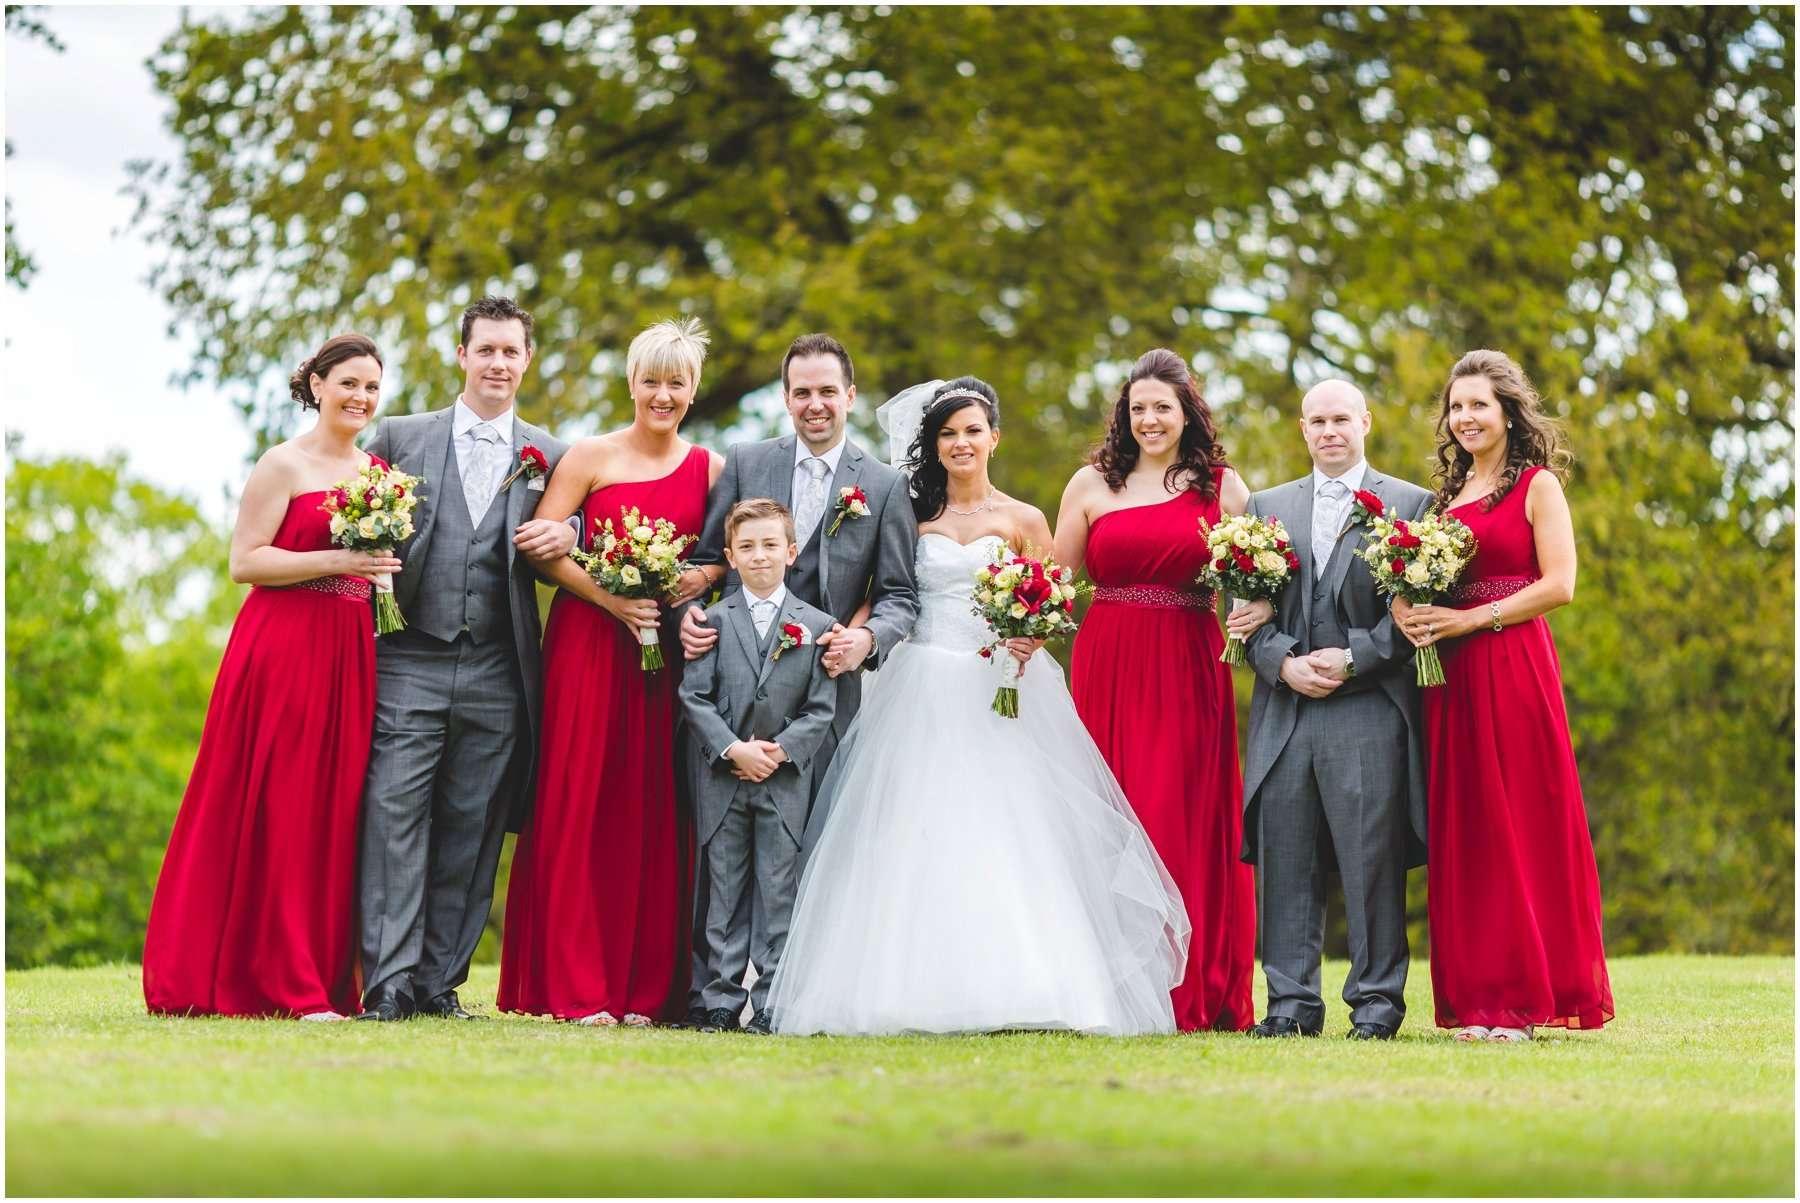 BRASTED'S WEDDING - JENNY AND JONNY - NORWICH WEDDING PHOTOGRAPHER 3